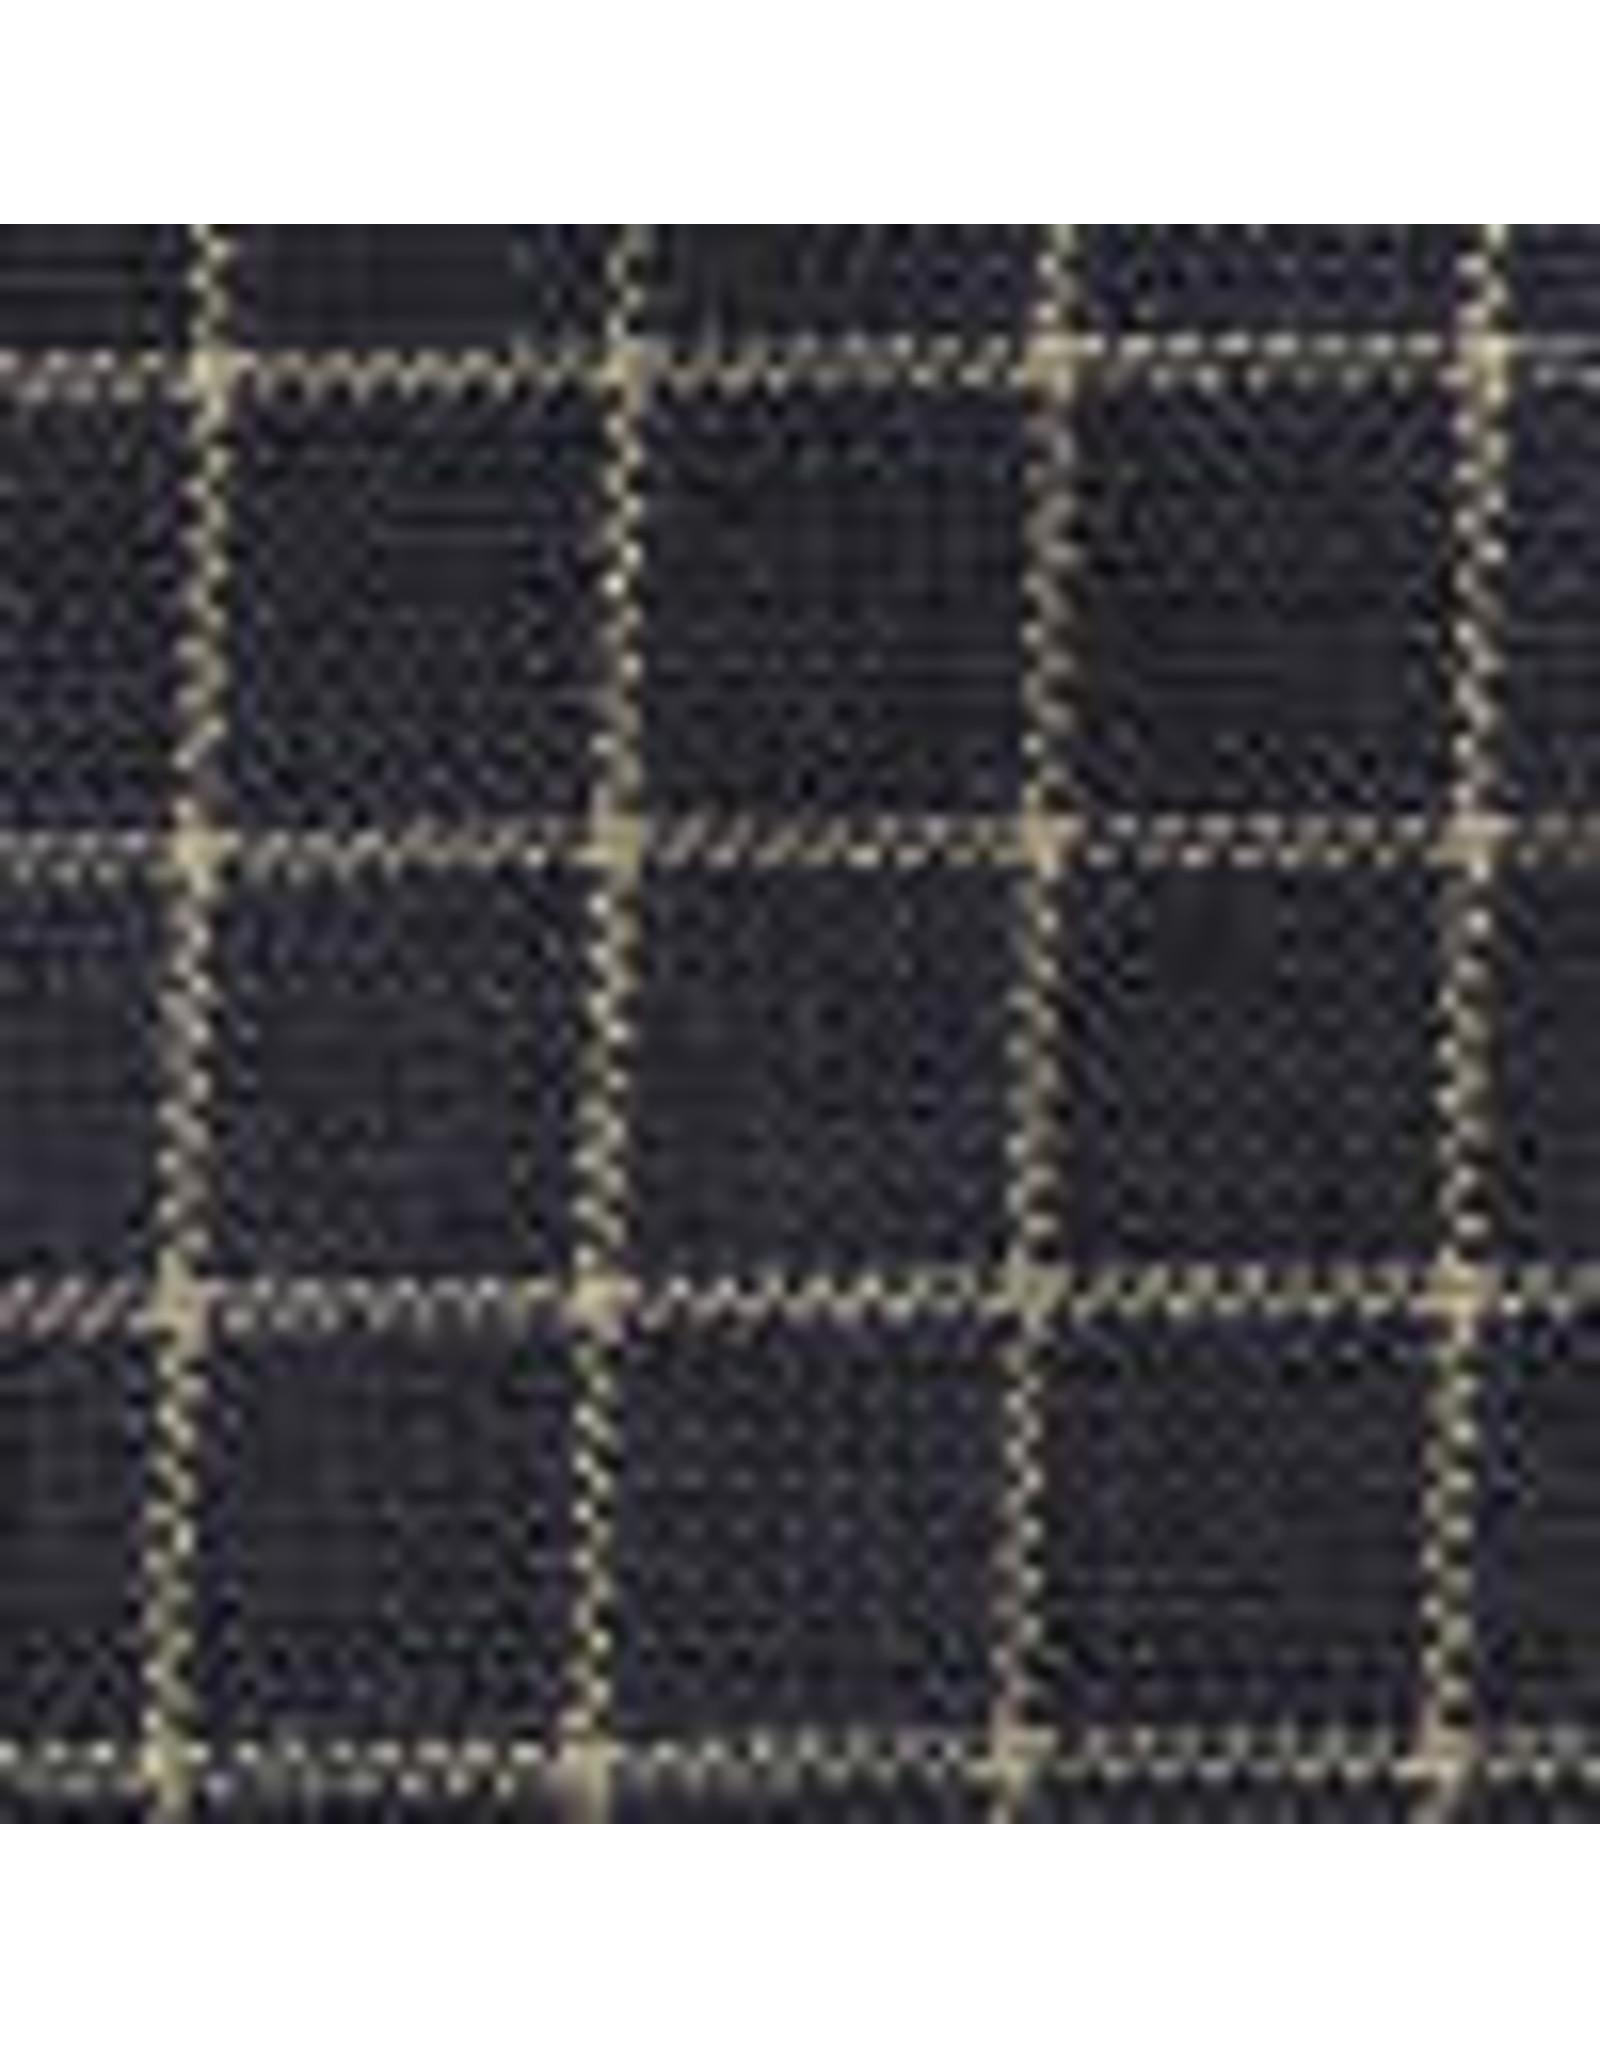 Yd. Navy and Tan Small Window Pane Fabric #203